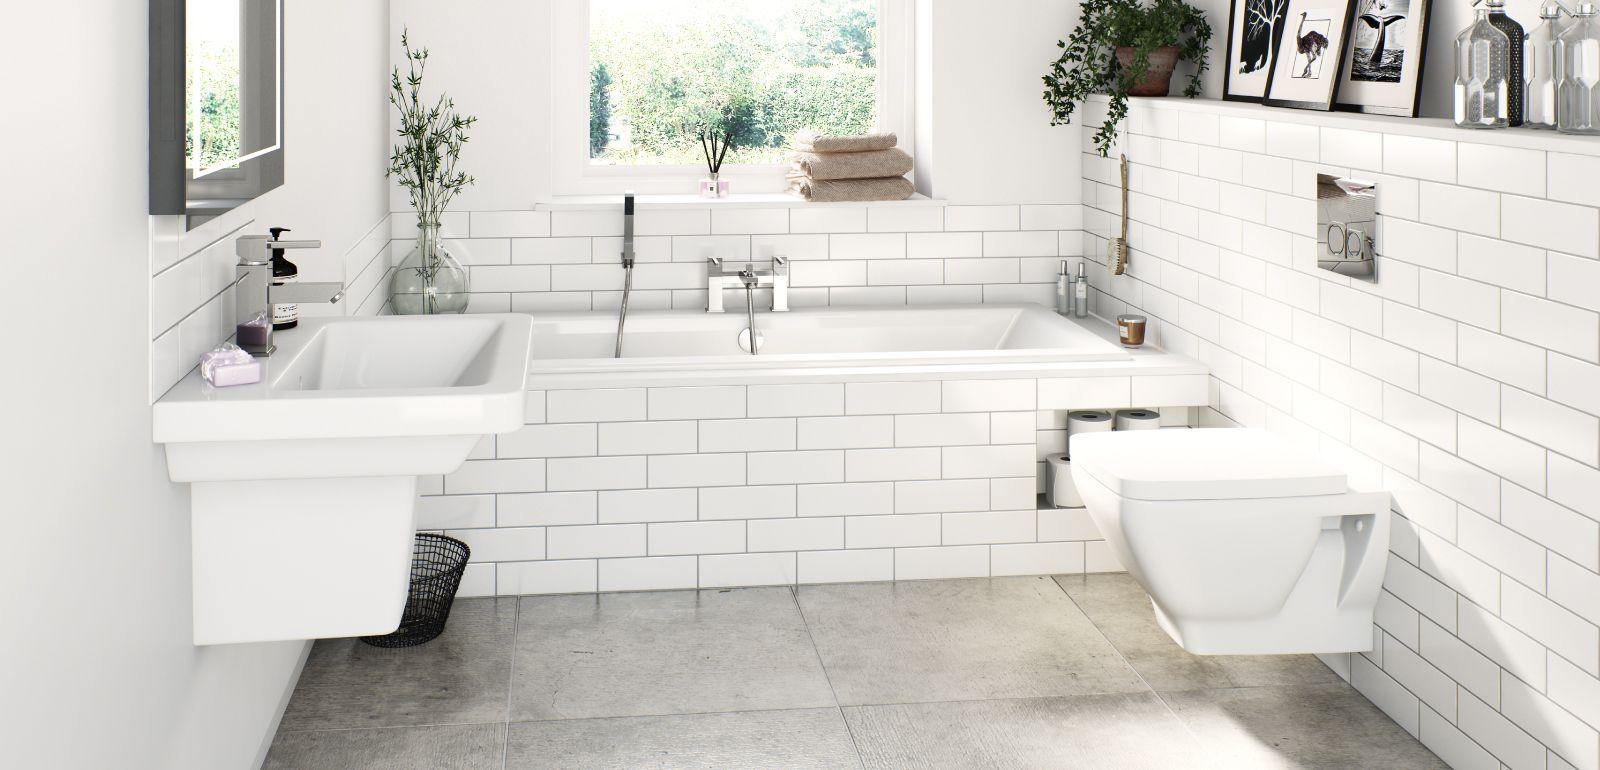 Verso Bathroom Suite Range | Bathrooms | Pinterest | Ranges